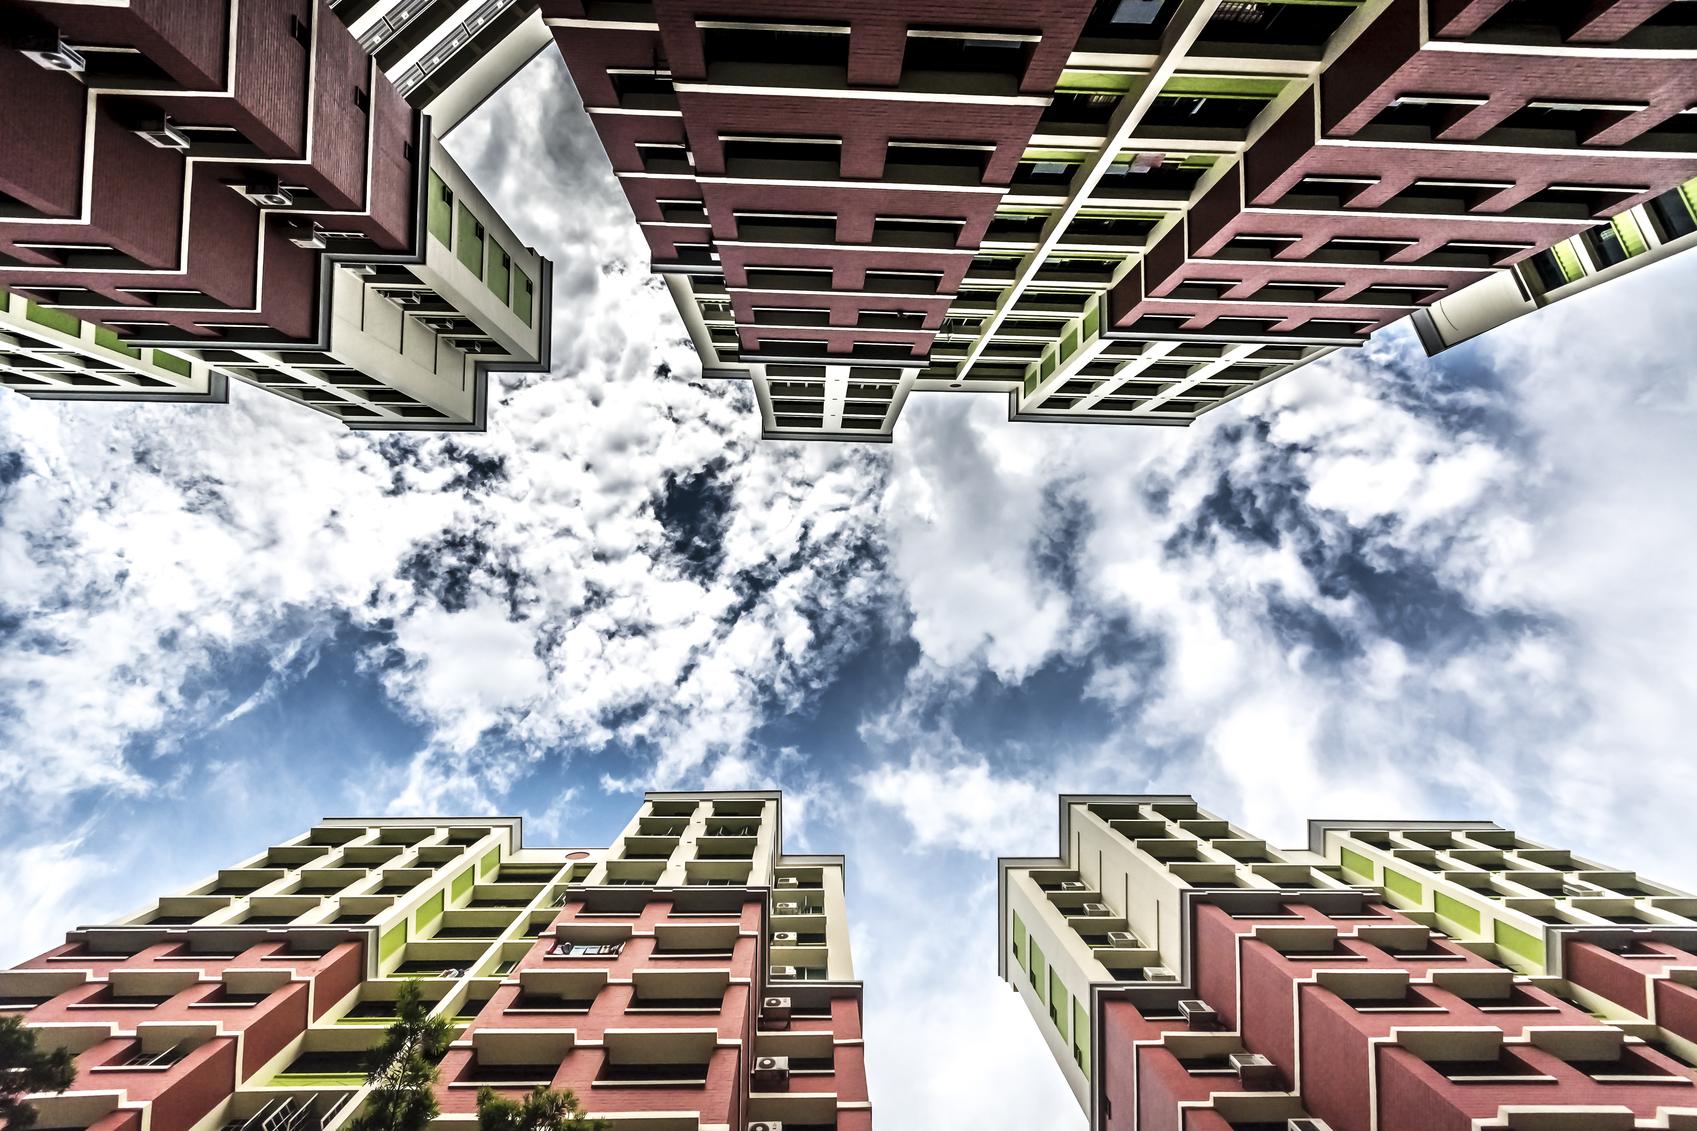 leasehold-property-option-when-tenure-ends-99-years-PropertyGuru